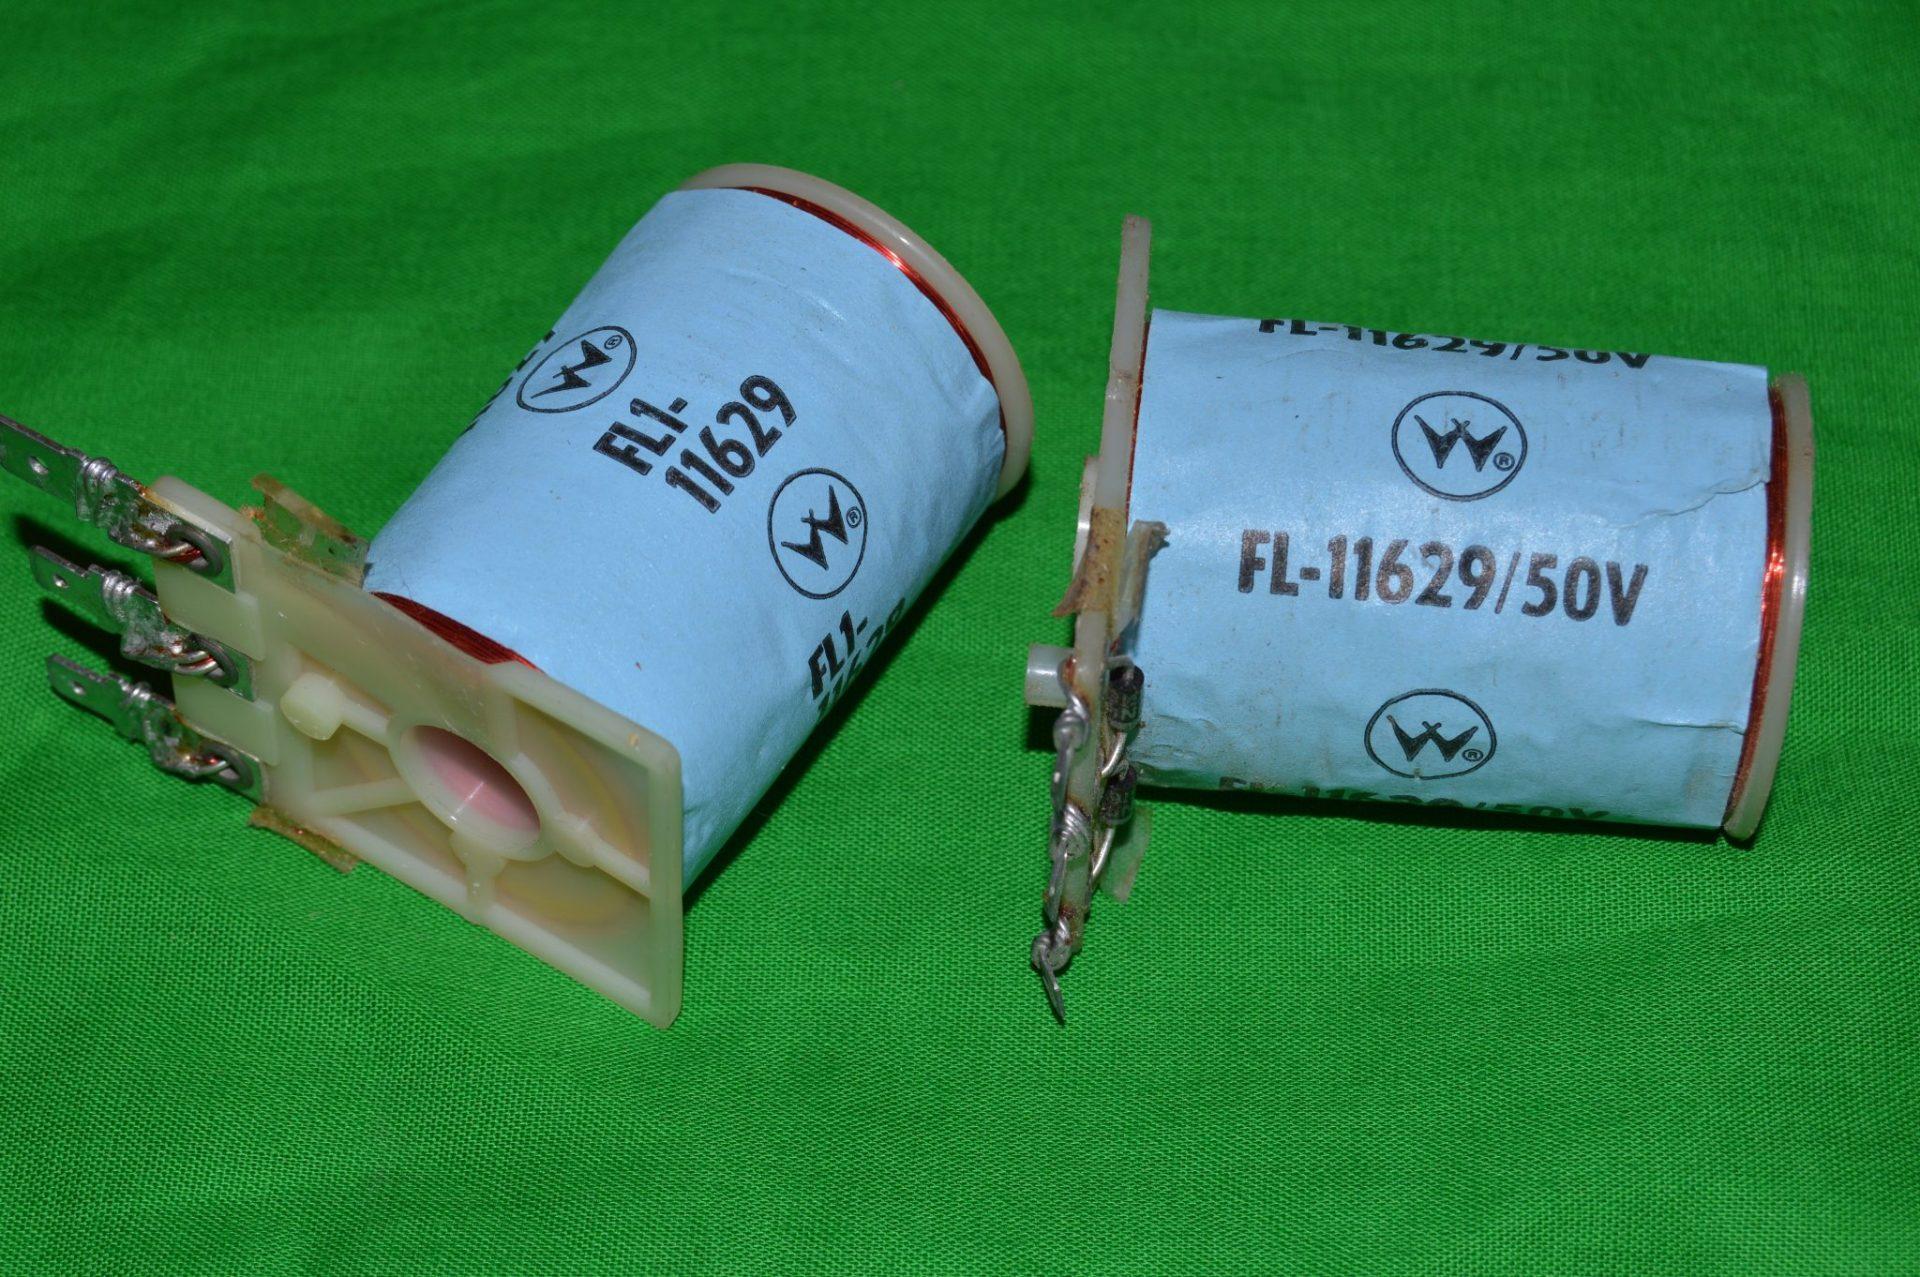 FL-11629 Williams Flipper Coil